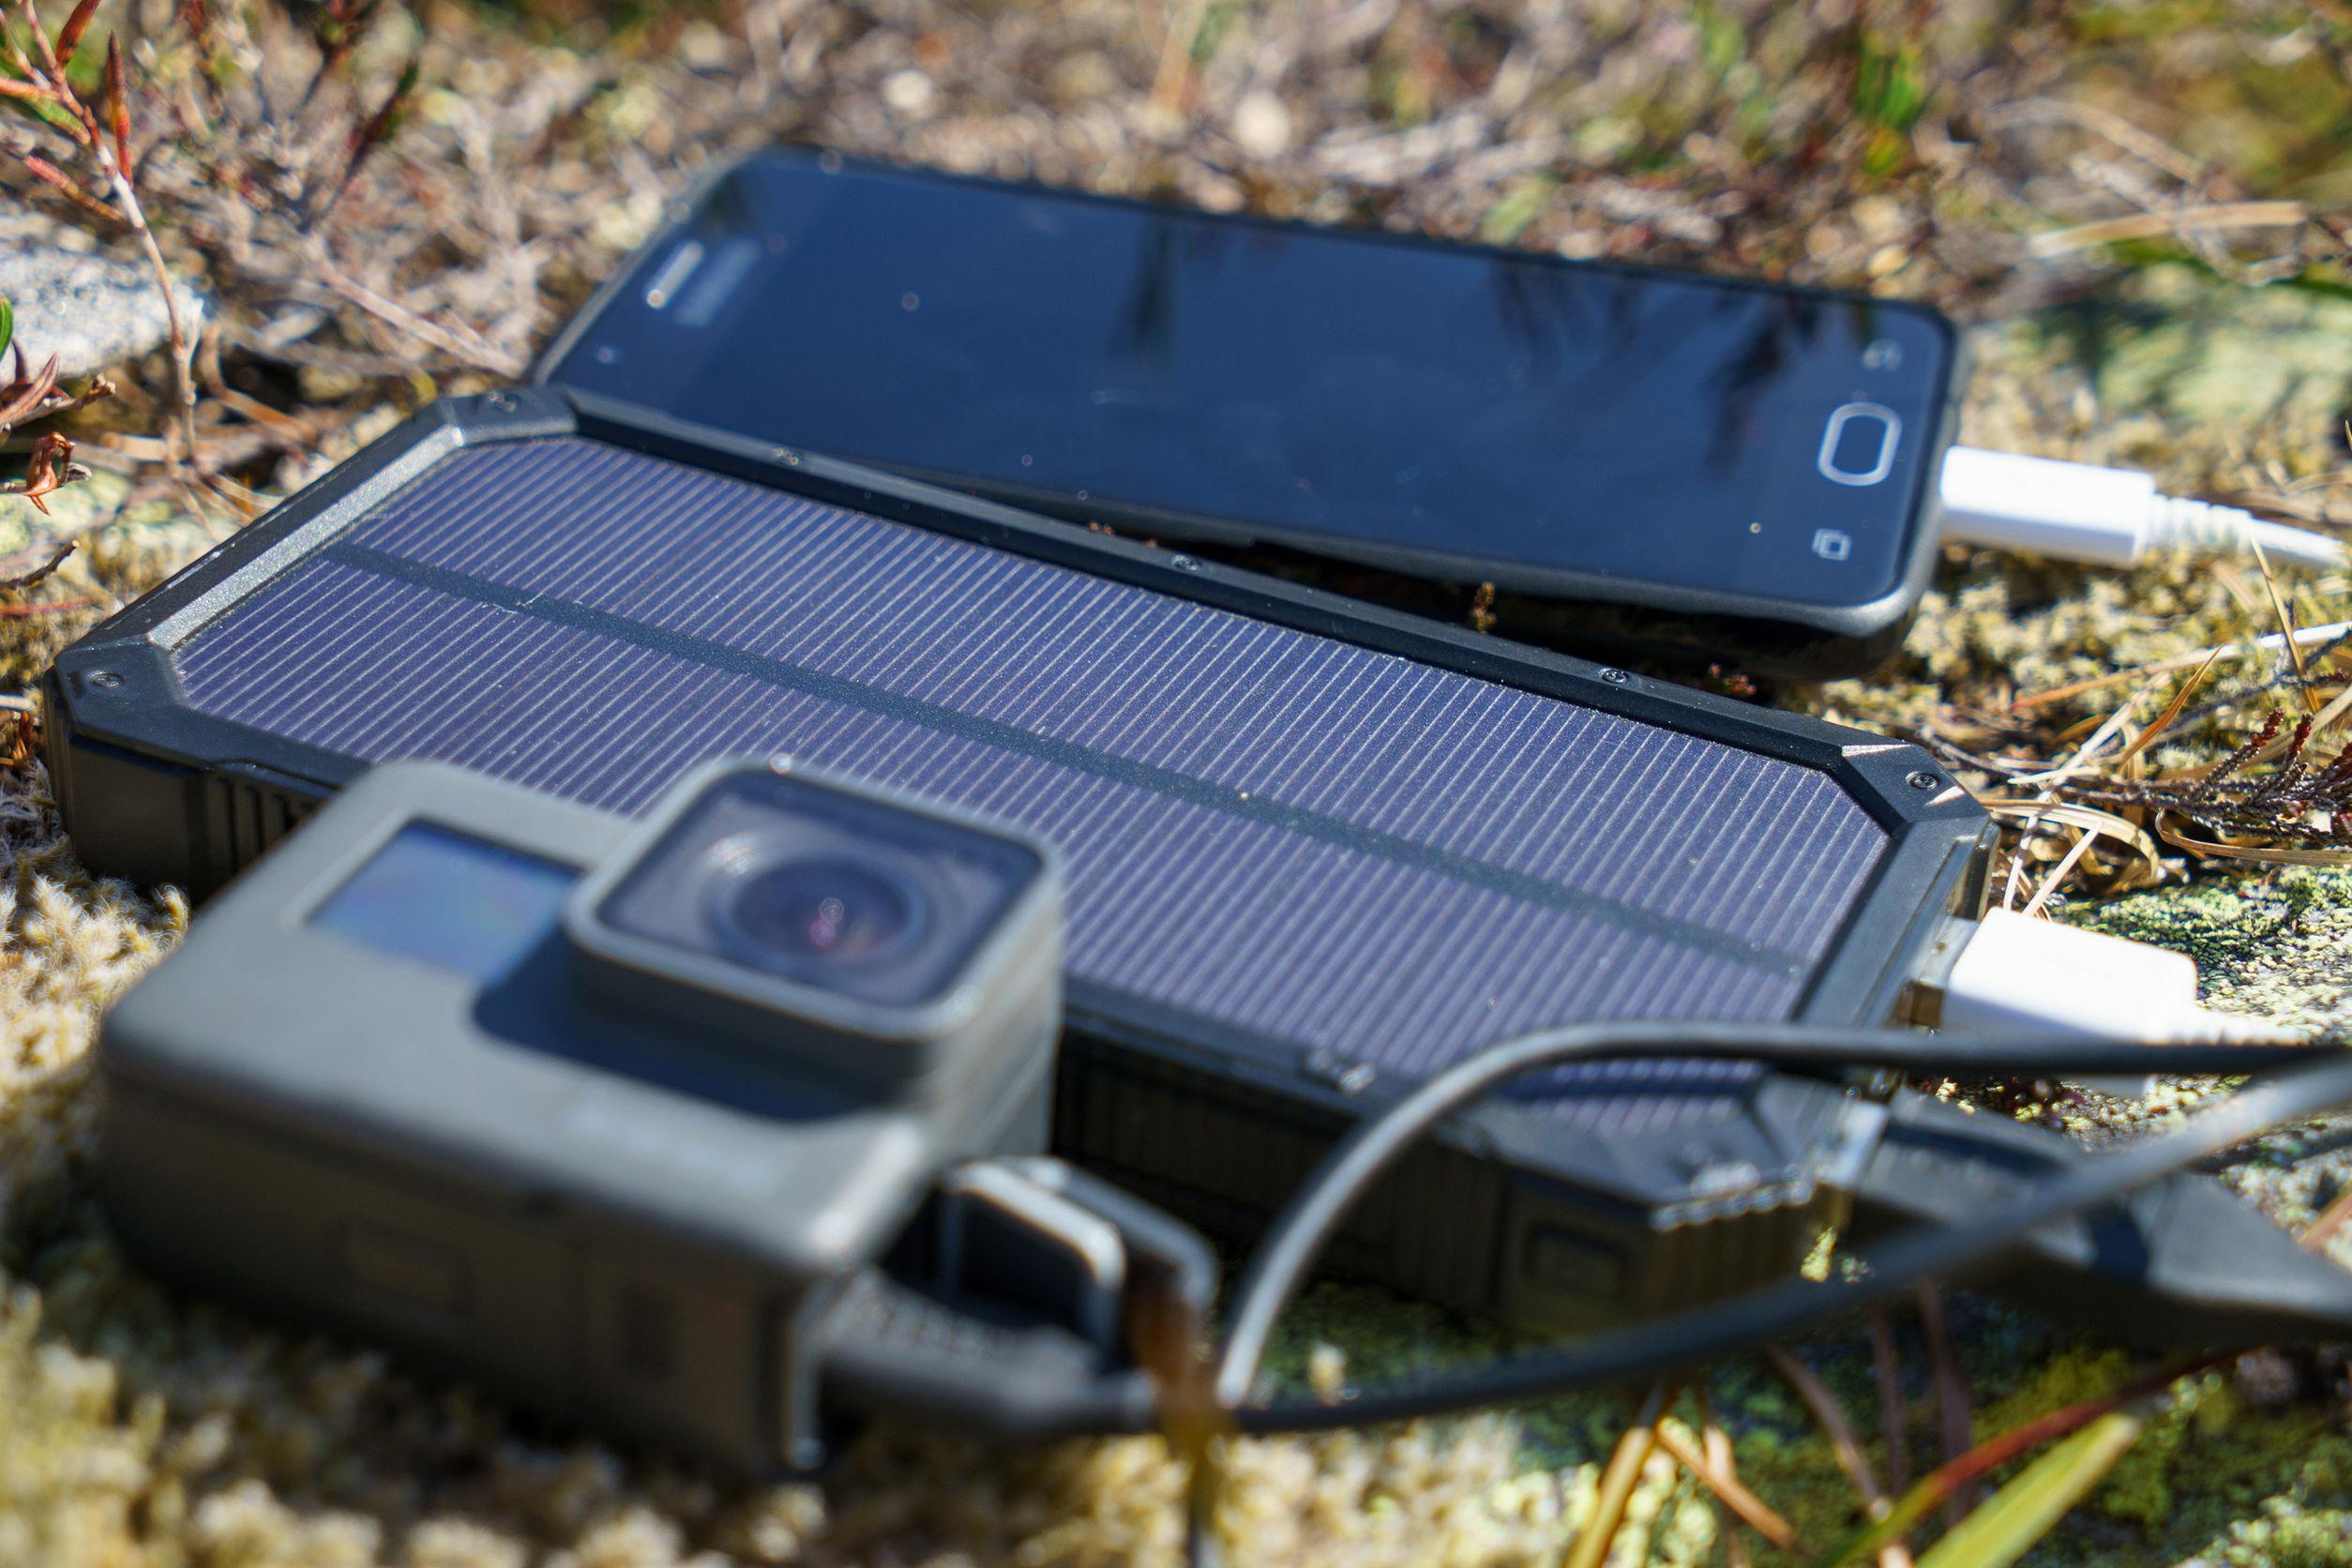 Caricabatterie solare per smartphone